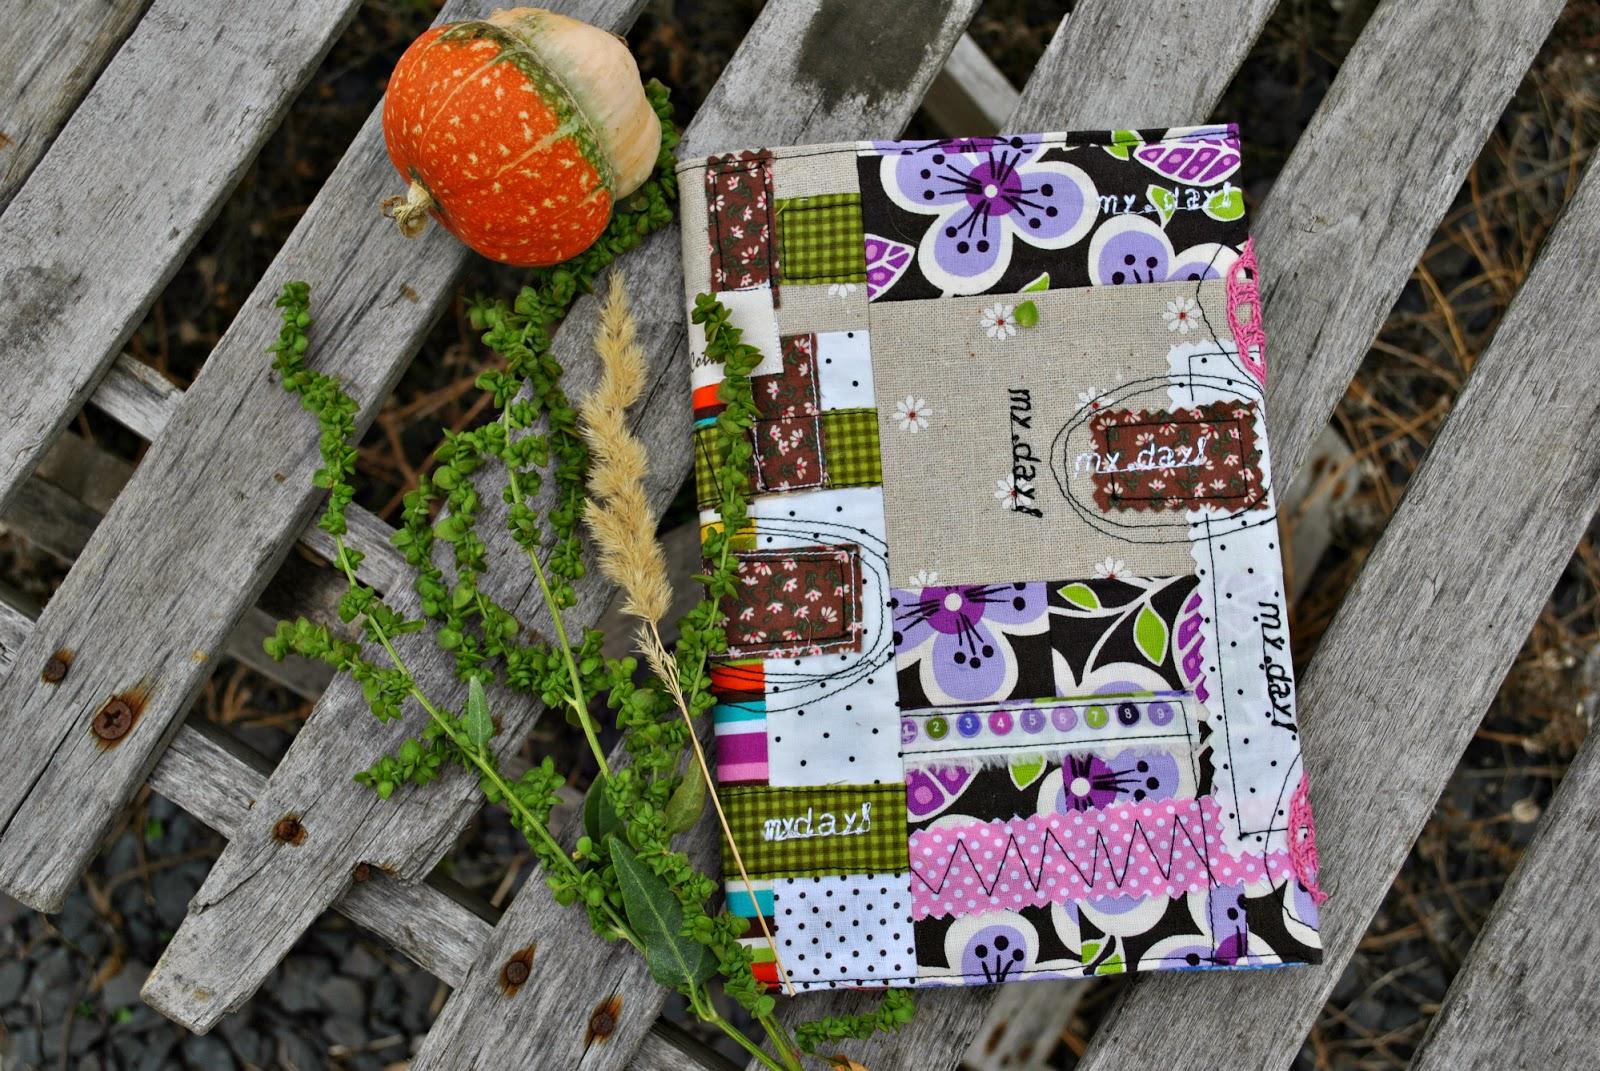 softbook, soft book, обложка, блокнот в твердой обложке, обложка на блокнот своими руками, текстильная обложка, обложки из ткани